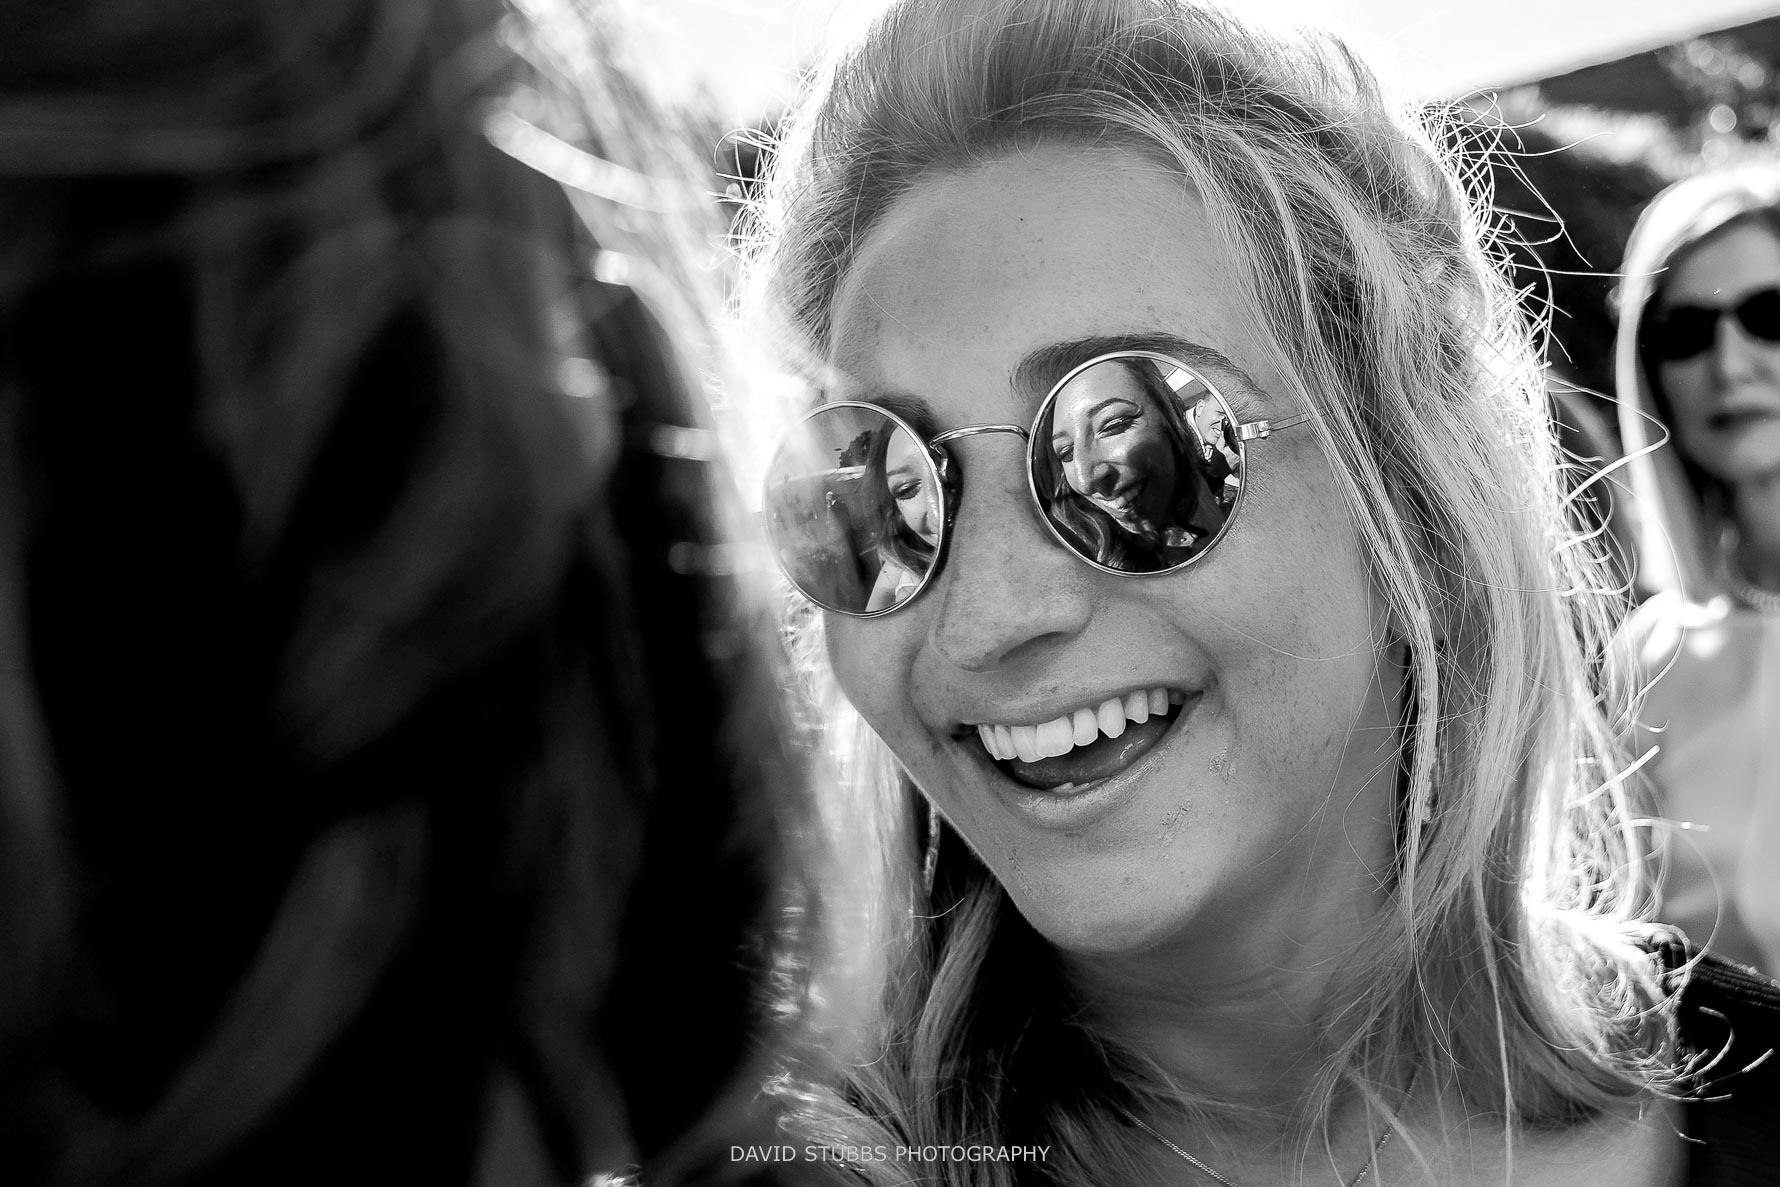 creative photo in the glasses